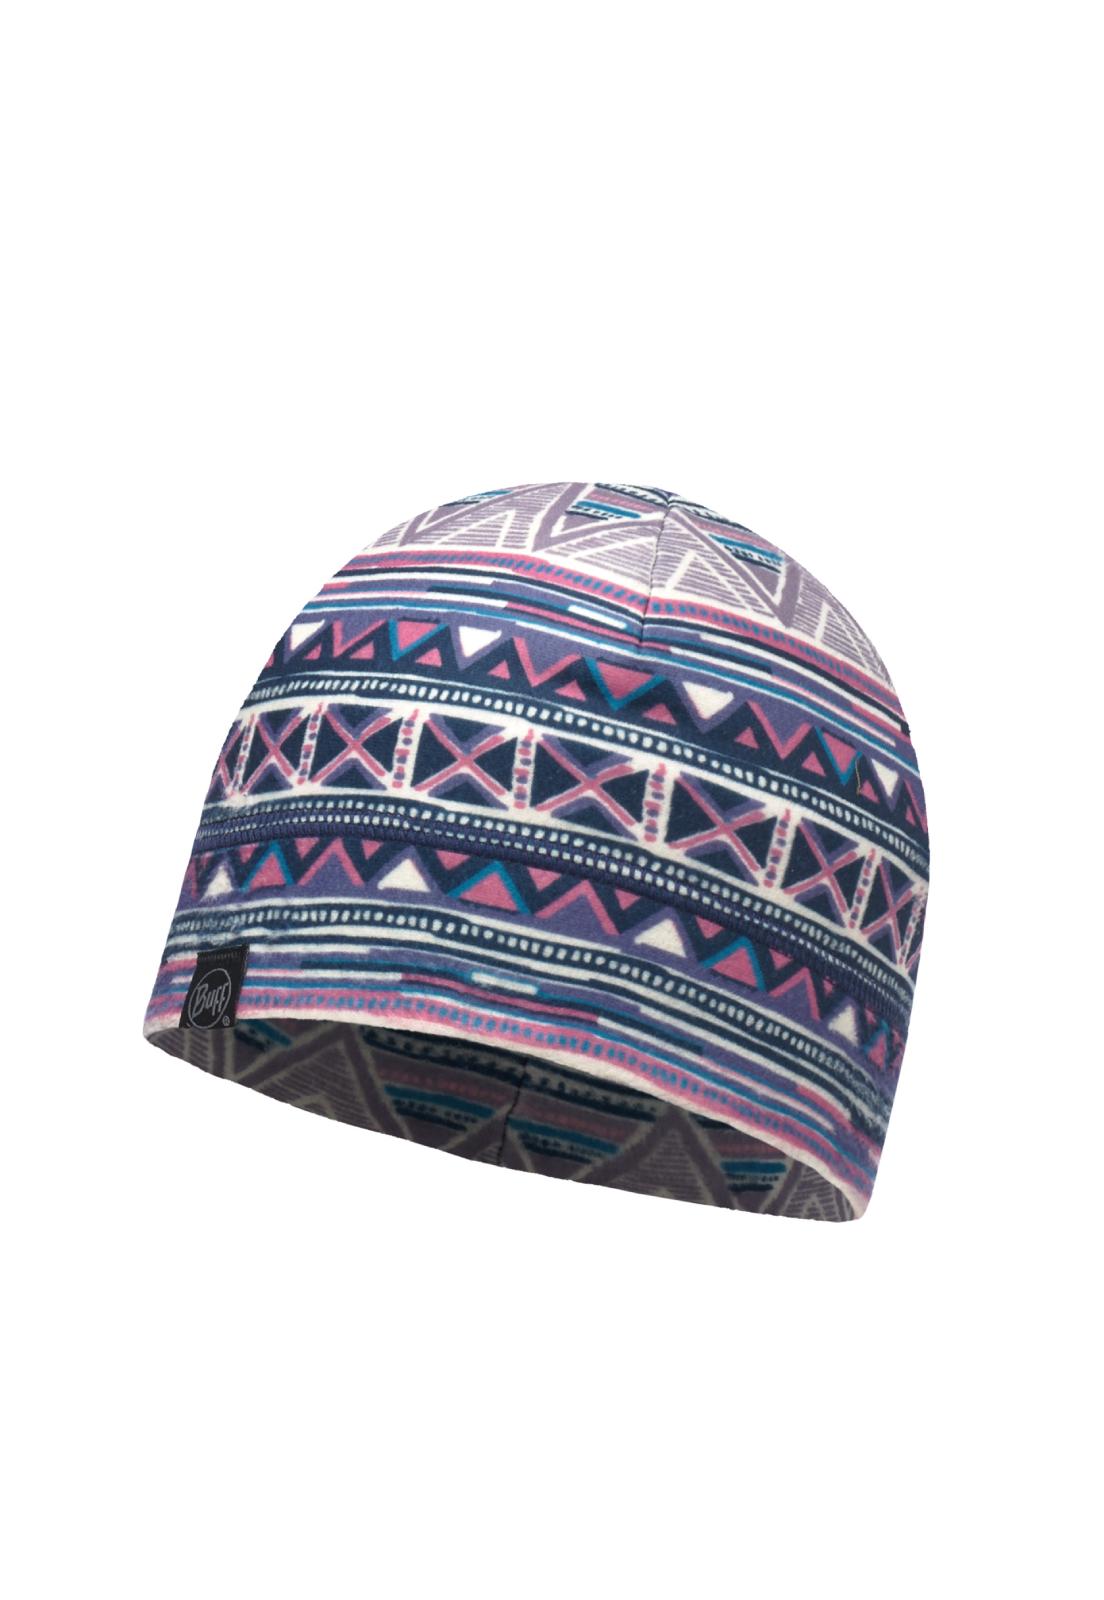 Polar Hat Jr & Child Tanok Multi / Cru